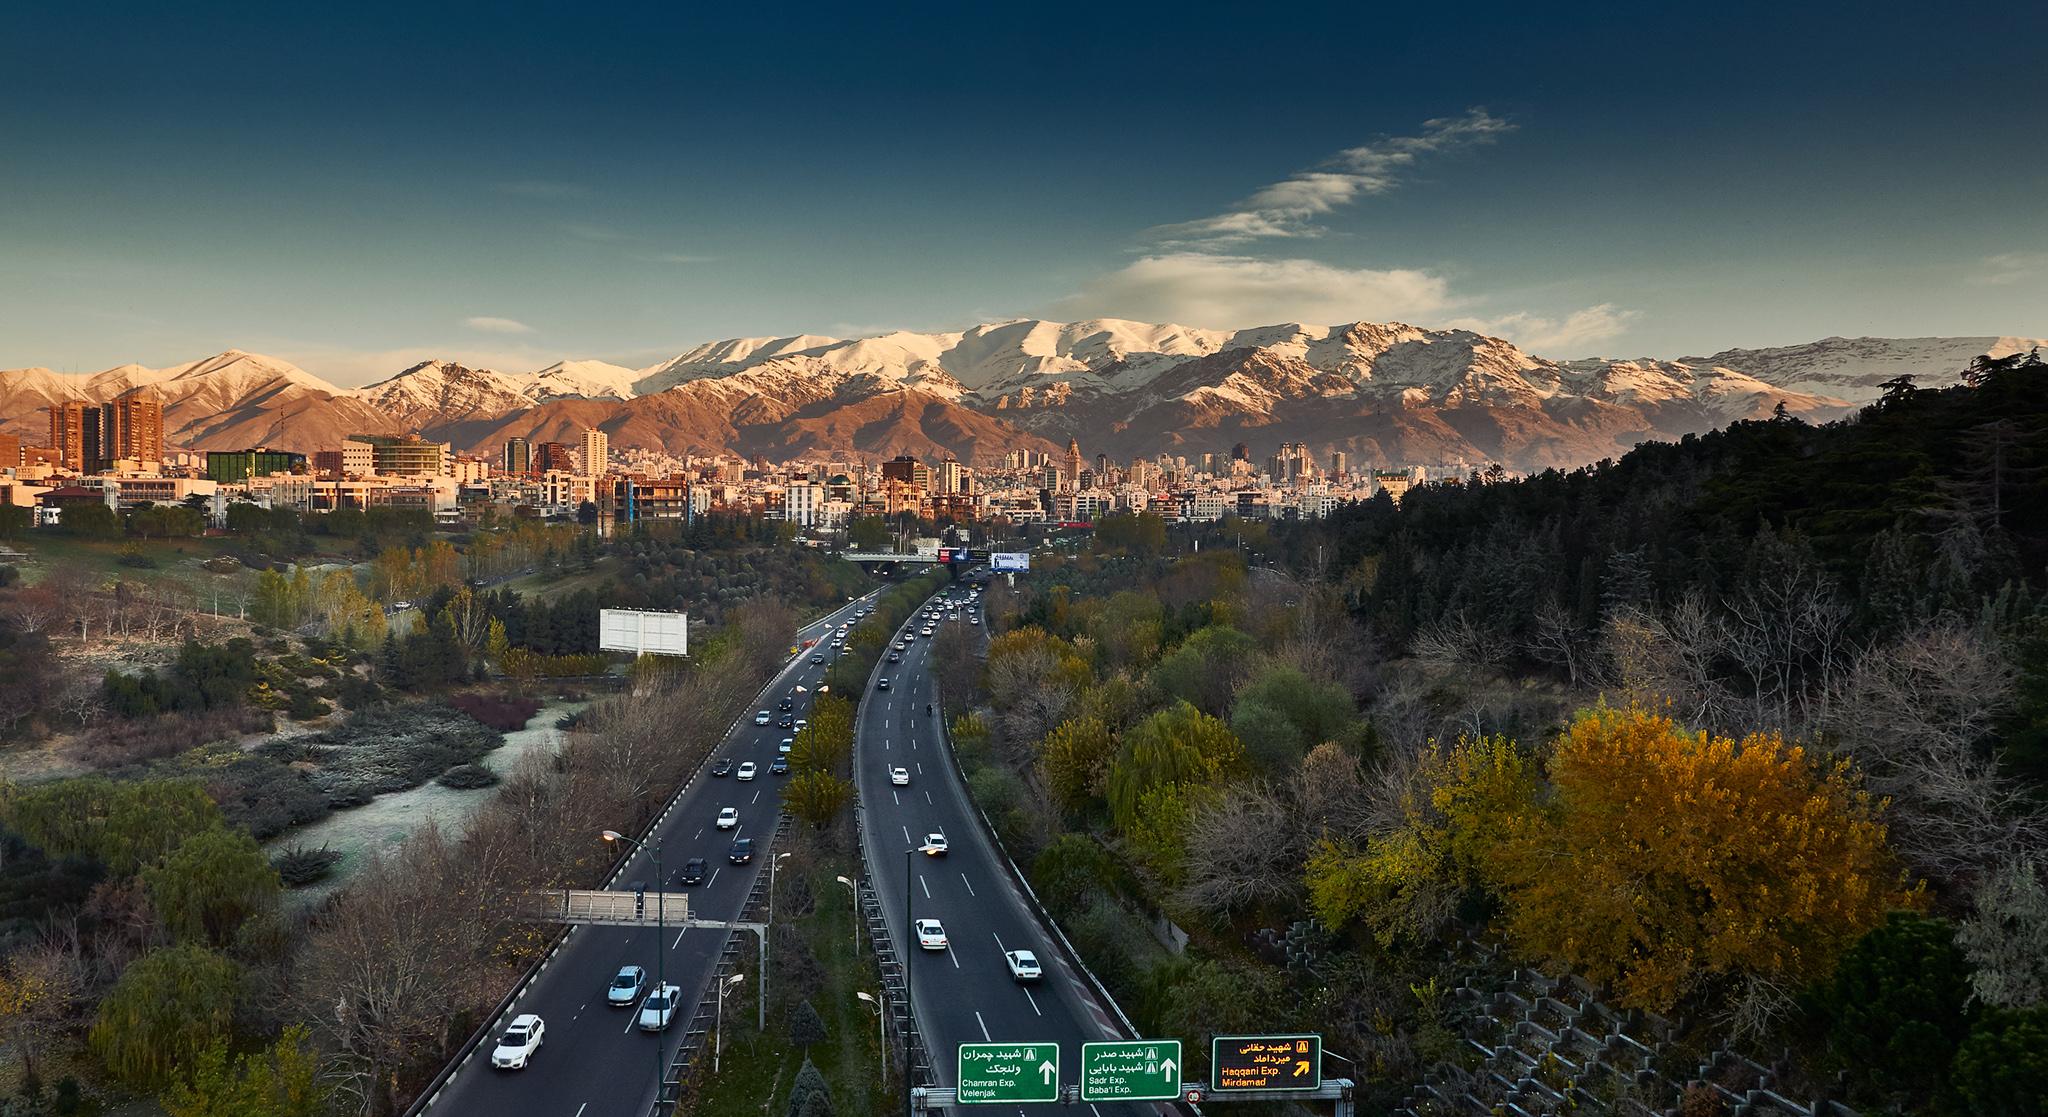 tehran_alborz-mountains_early-morning_tabiat-bridge_highway_02.jpg